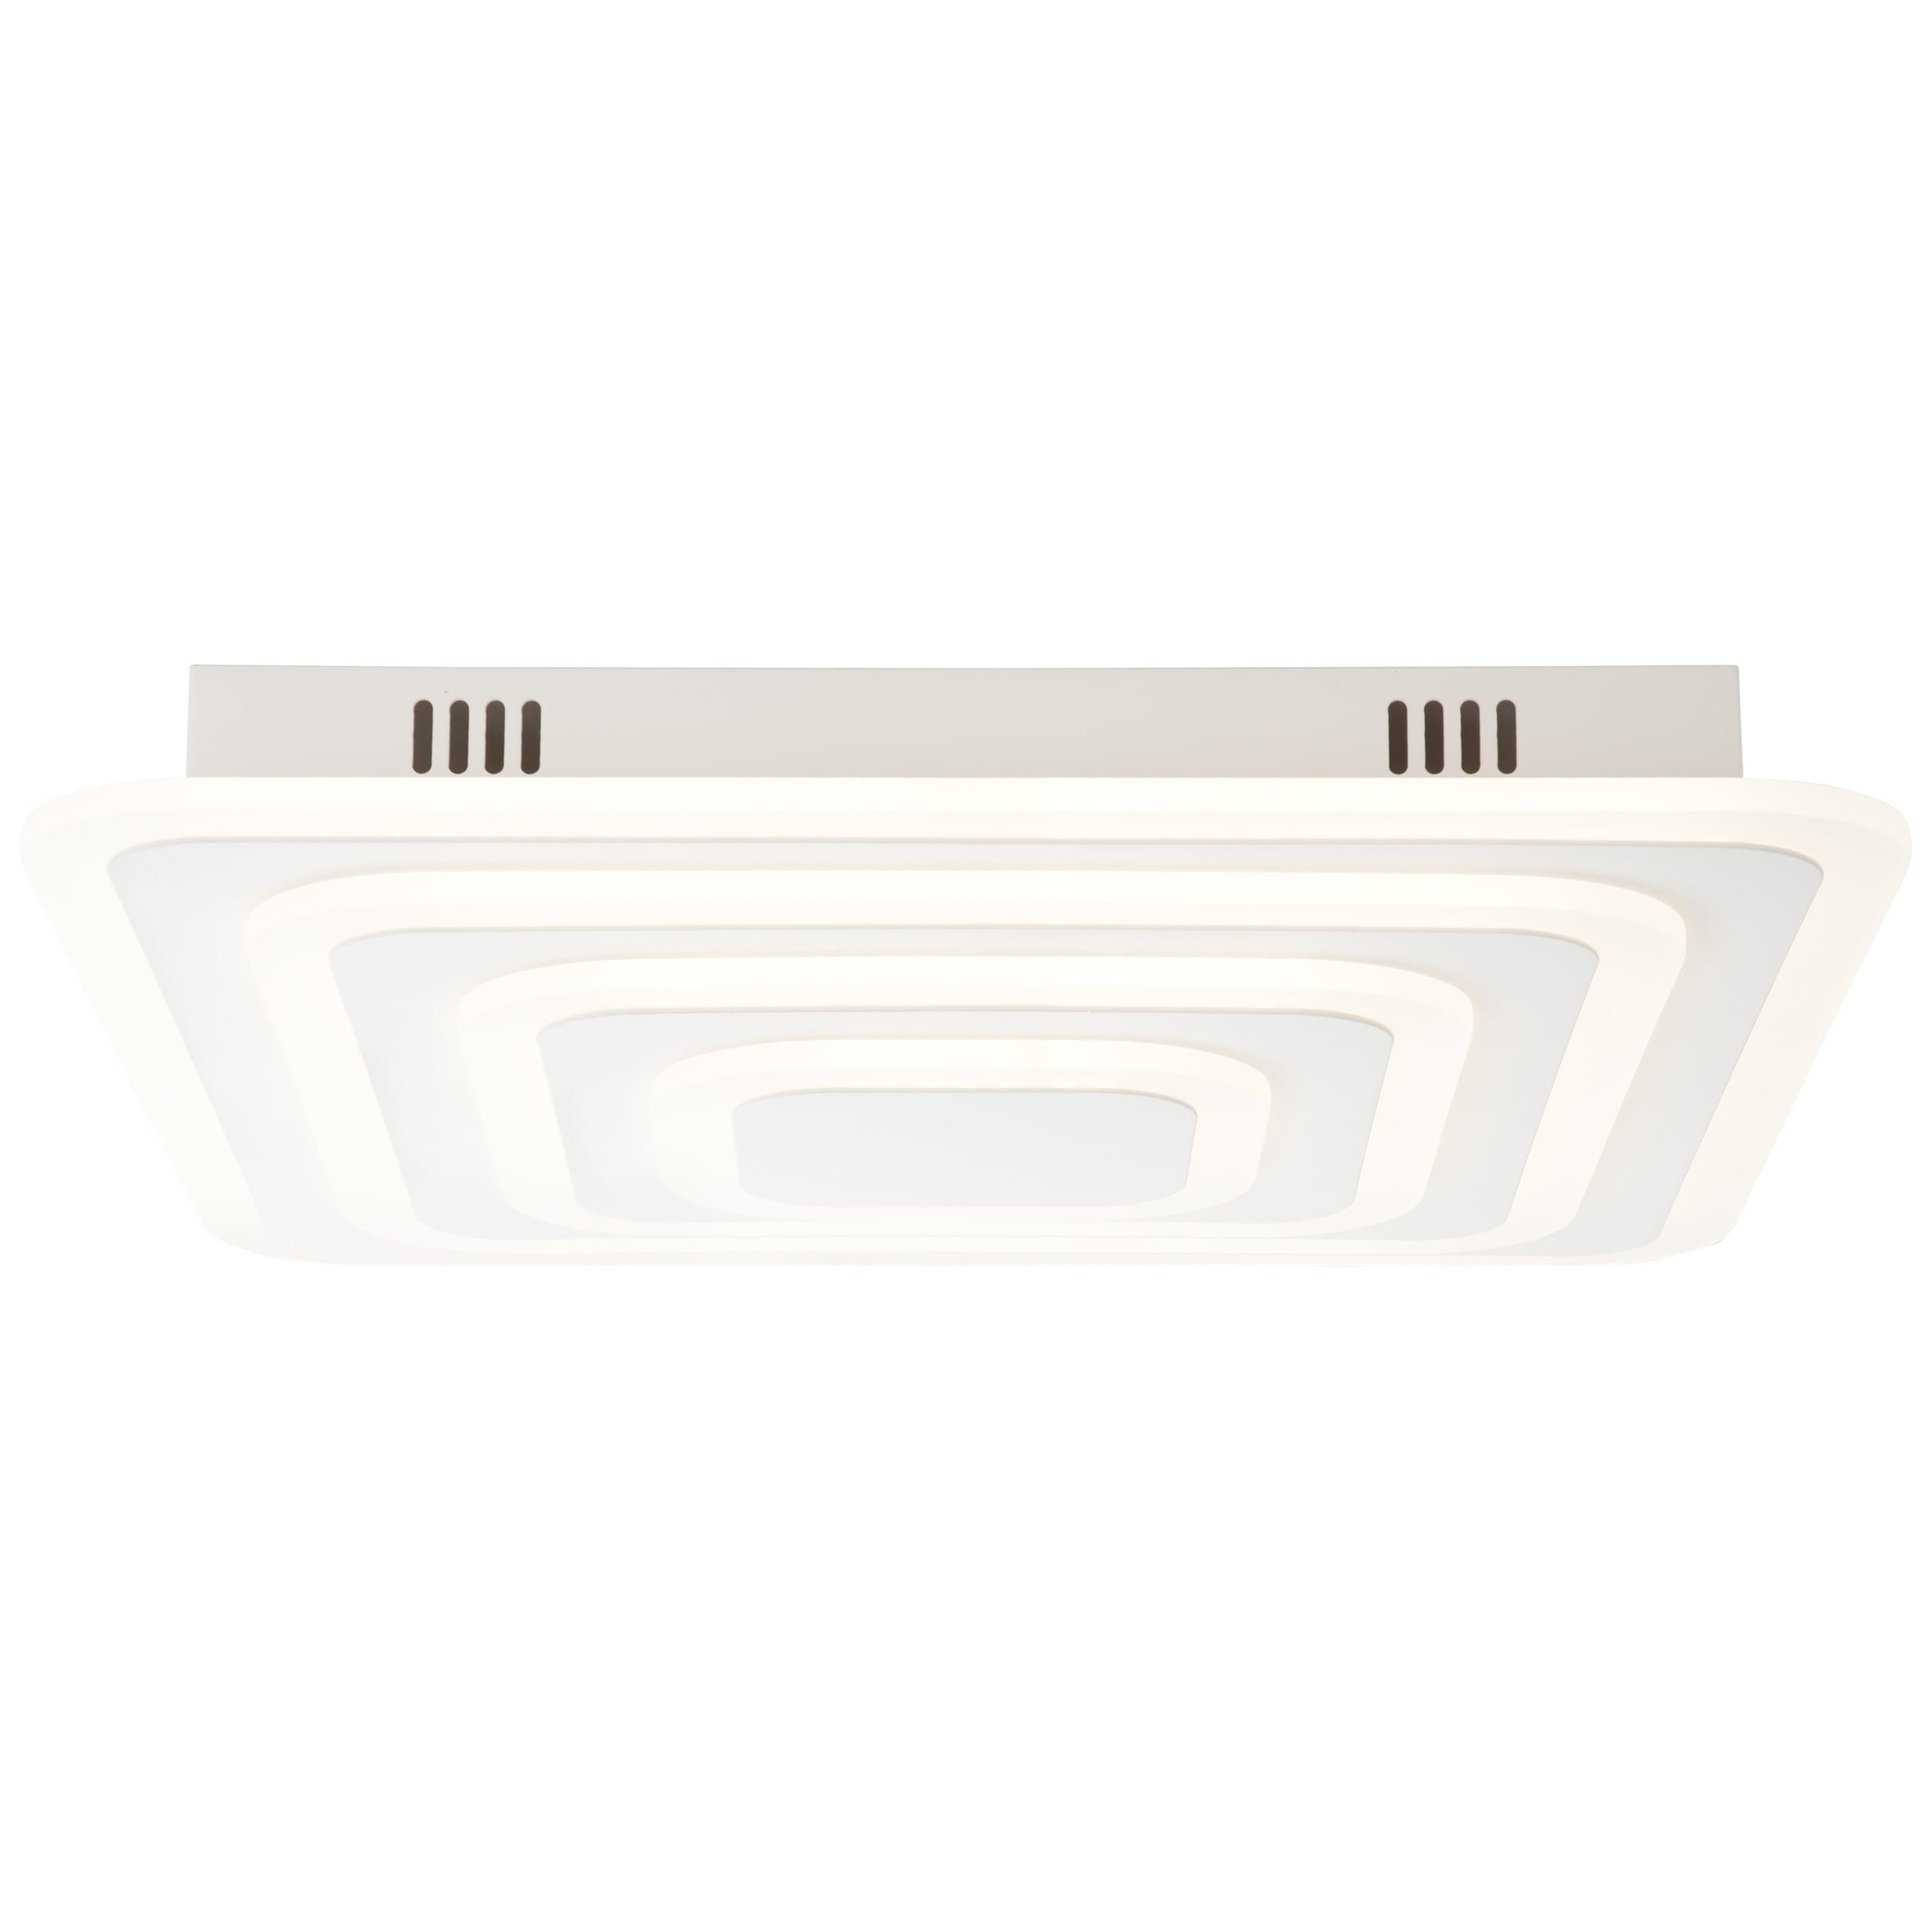 AEG Caresa LED Deckenleuchte 47x47cm sand/weiß